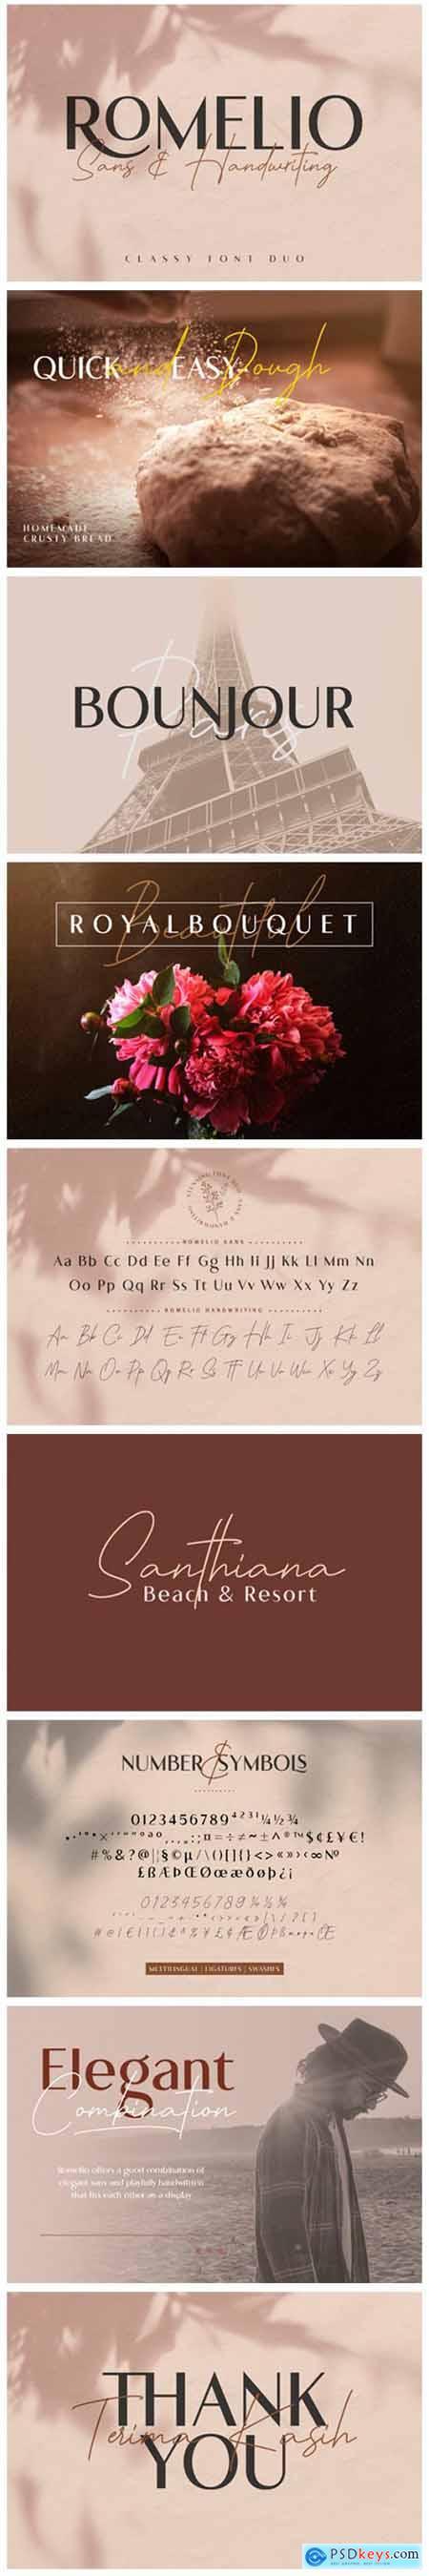 Romelio Font